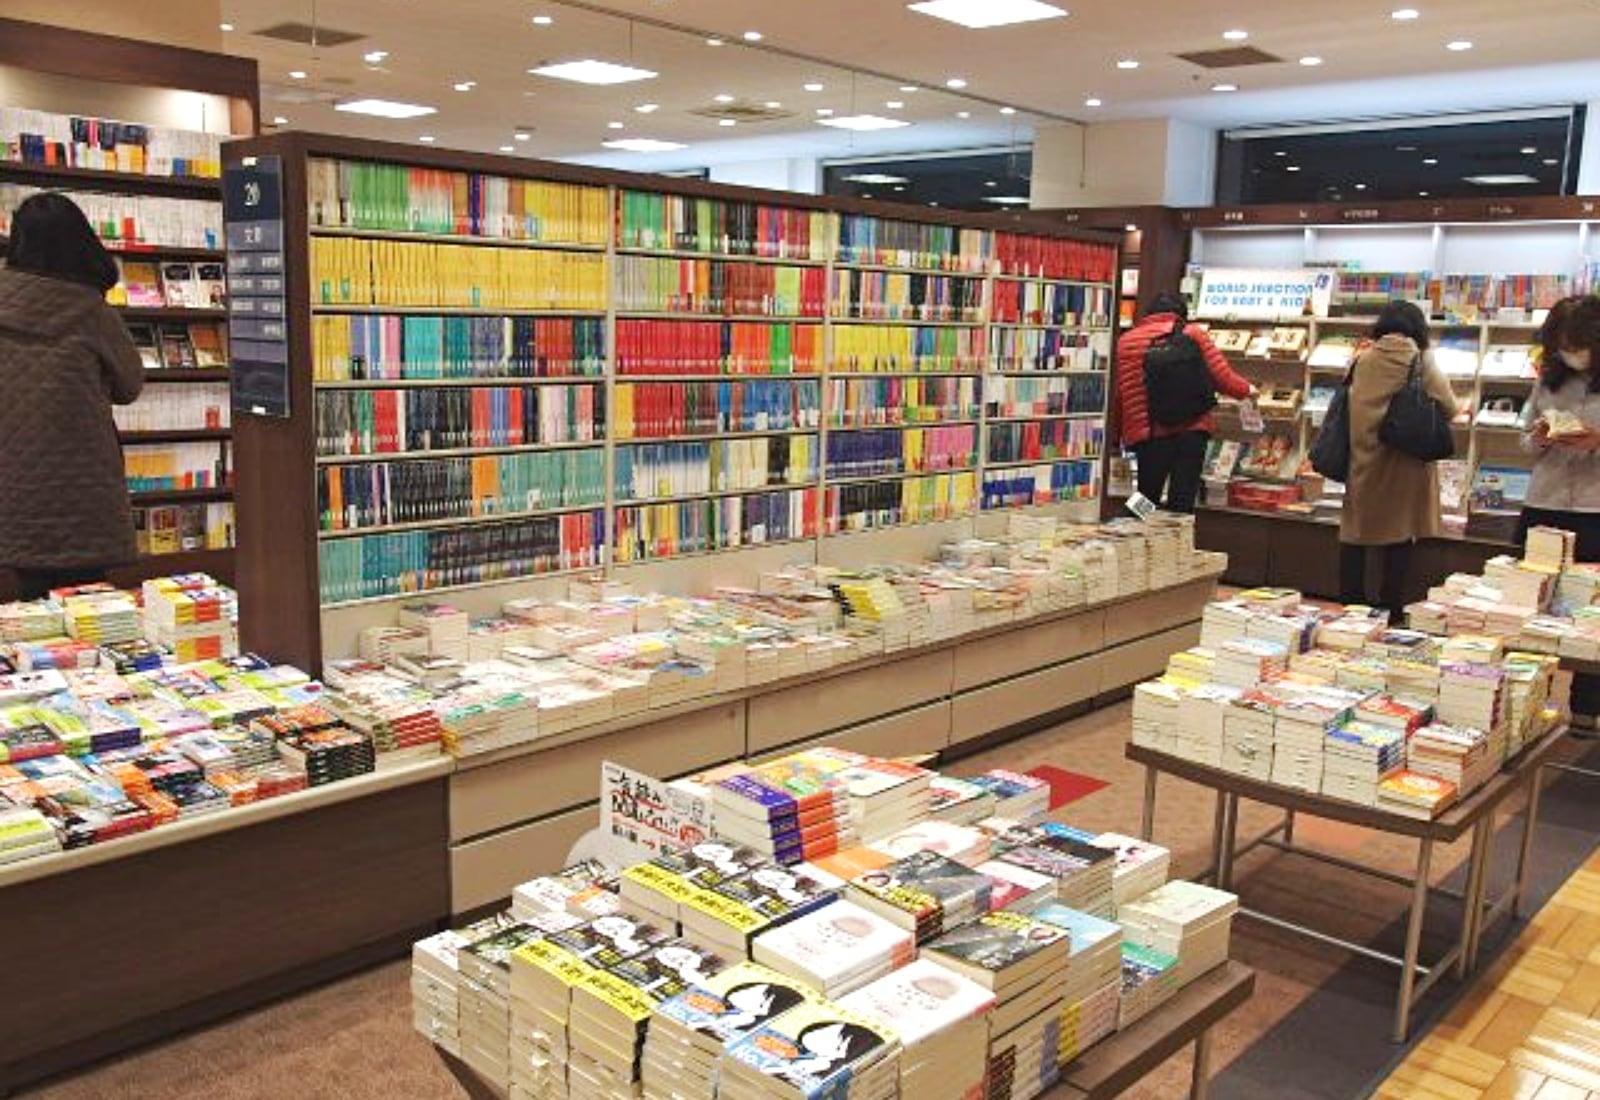 Yaesu Bookstore